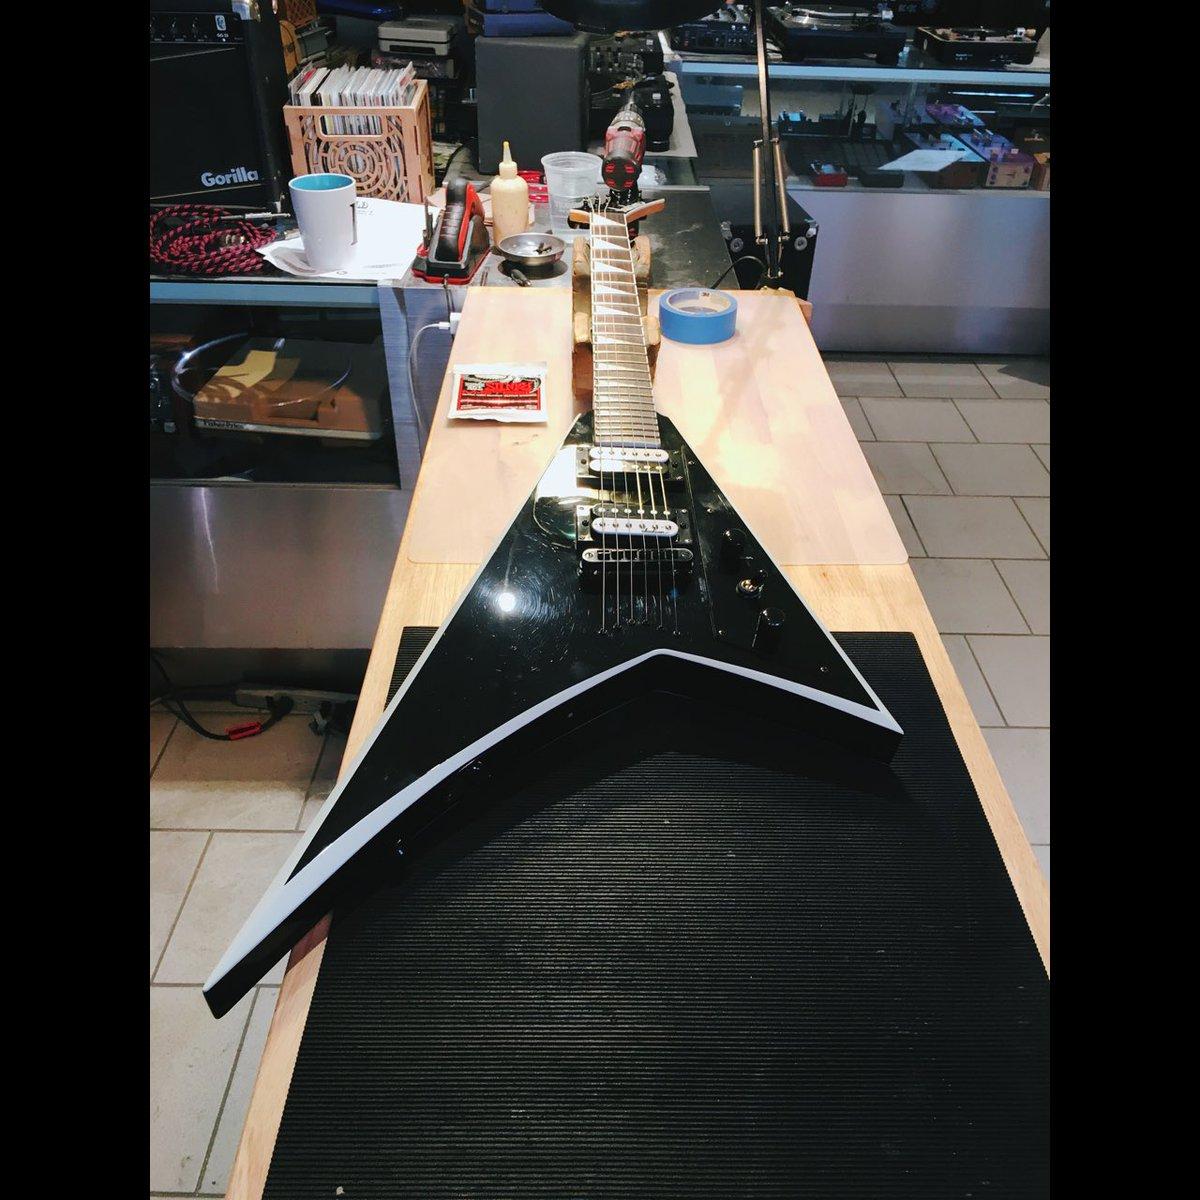 Jackson Randy Rhoads in for a drop C setup #jessedeandesigns #guitartech #stewmac #luthier #jacksonguitars #ernieball<br>http://pic.twitter.com/jbsoeM6nG3